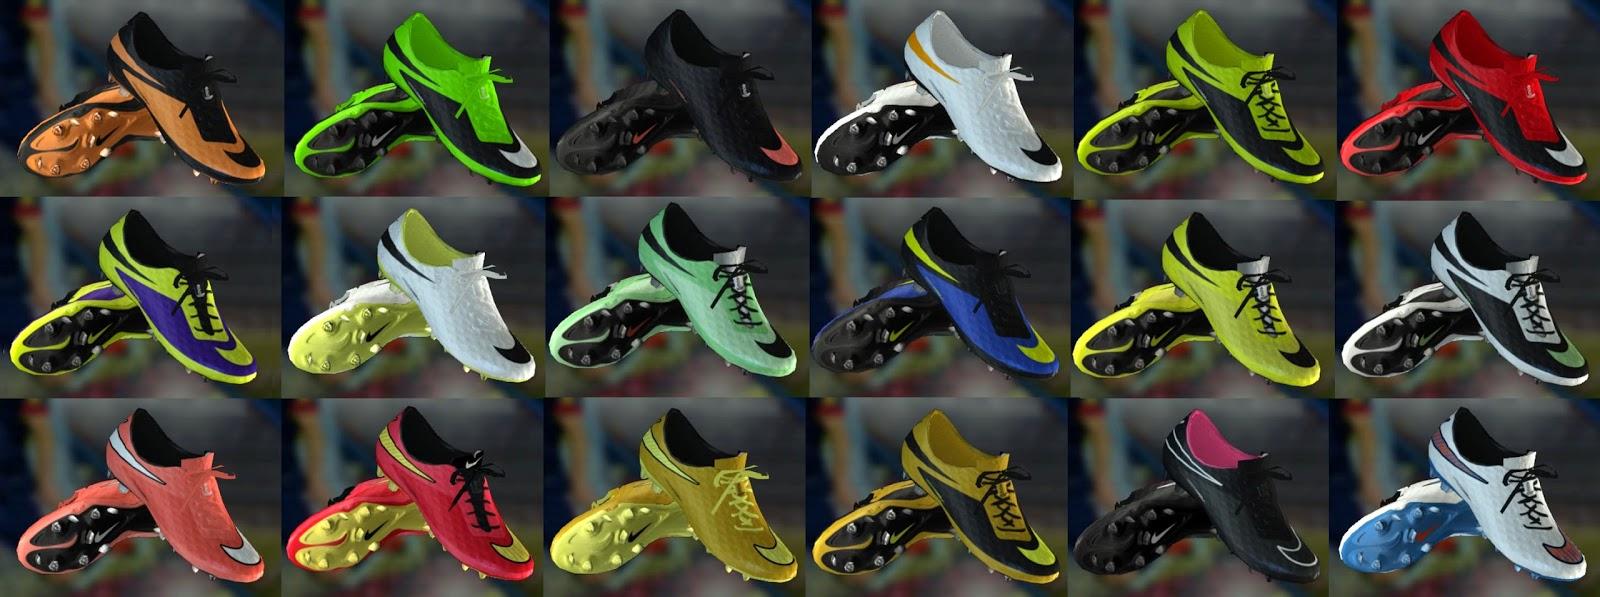 PES 2013 Bootpack Nike Hypervenom By Nach